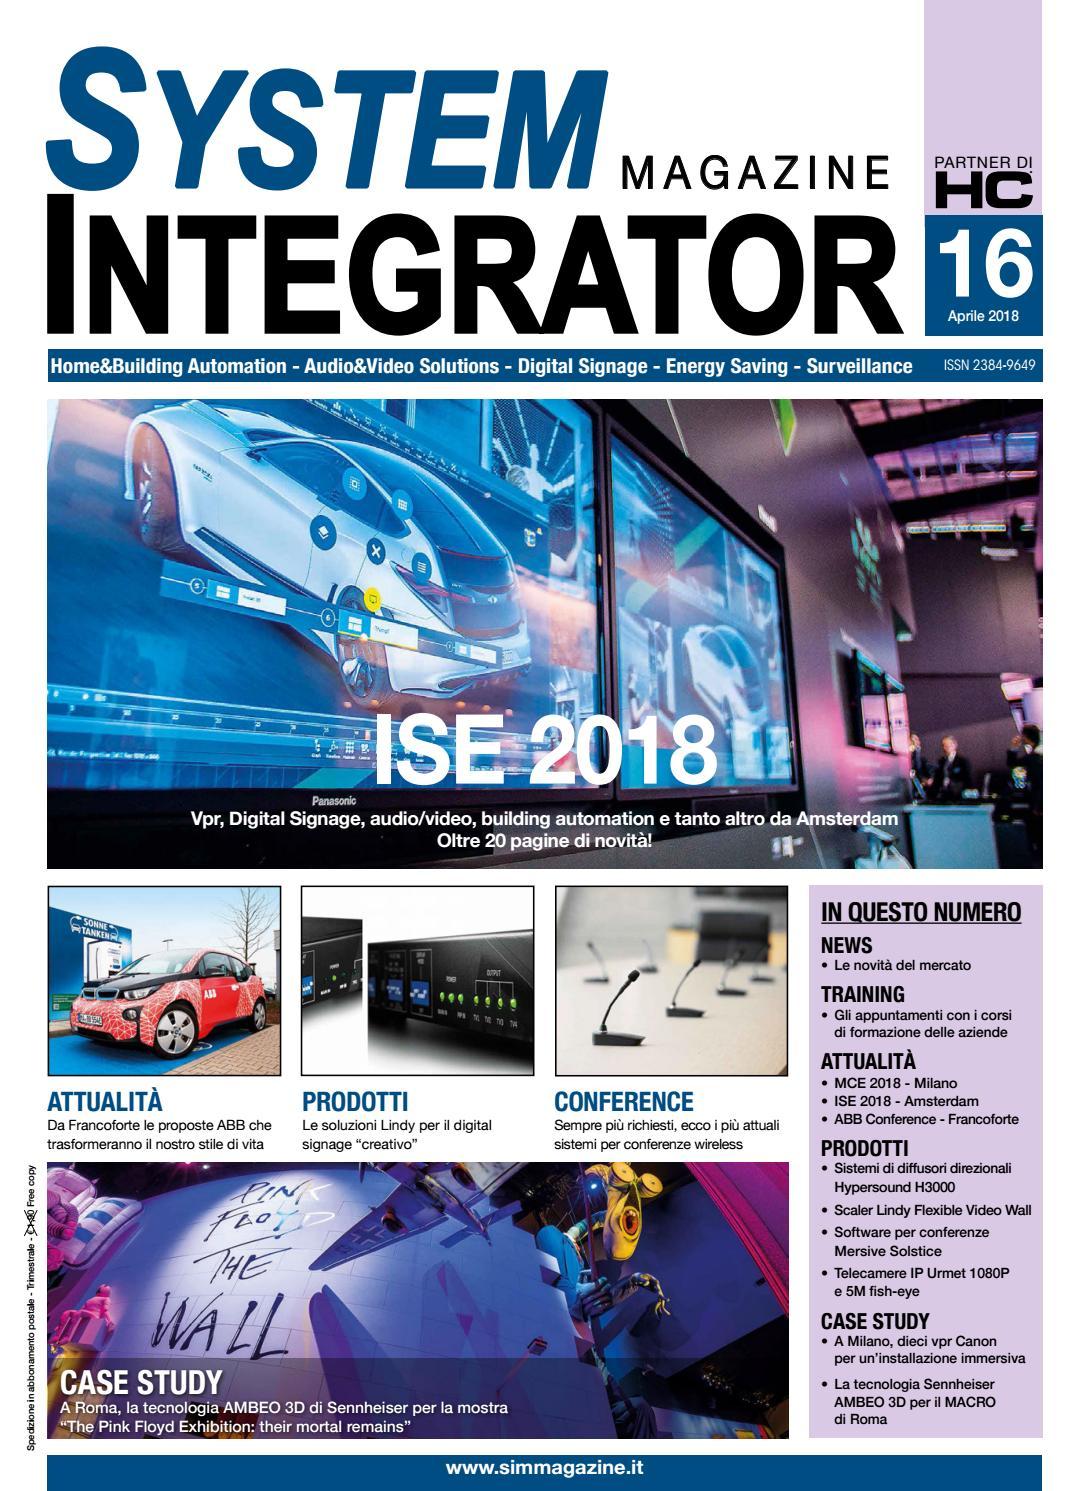 System Integrator Magazine #16 by SIM System Integrator